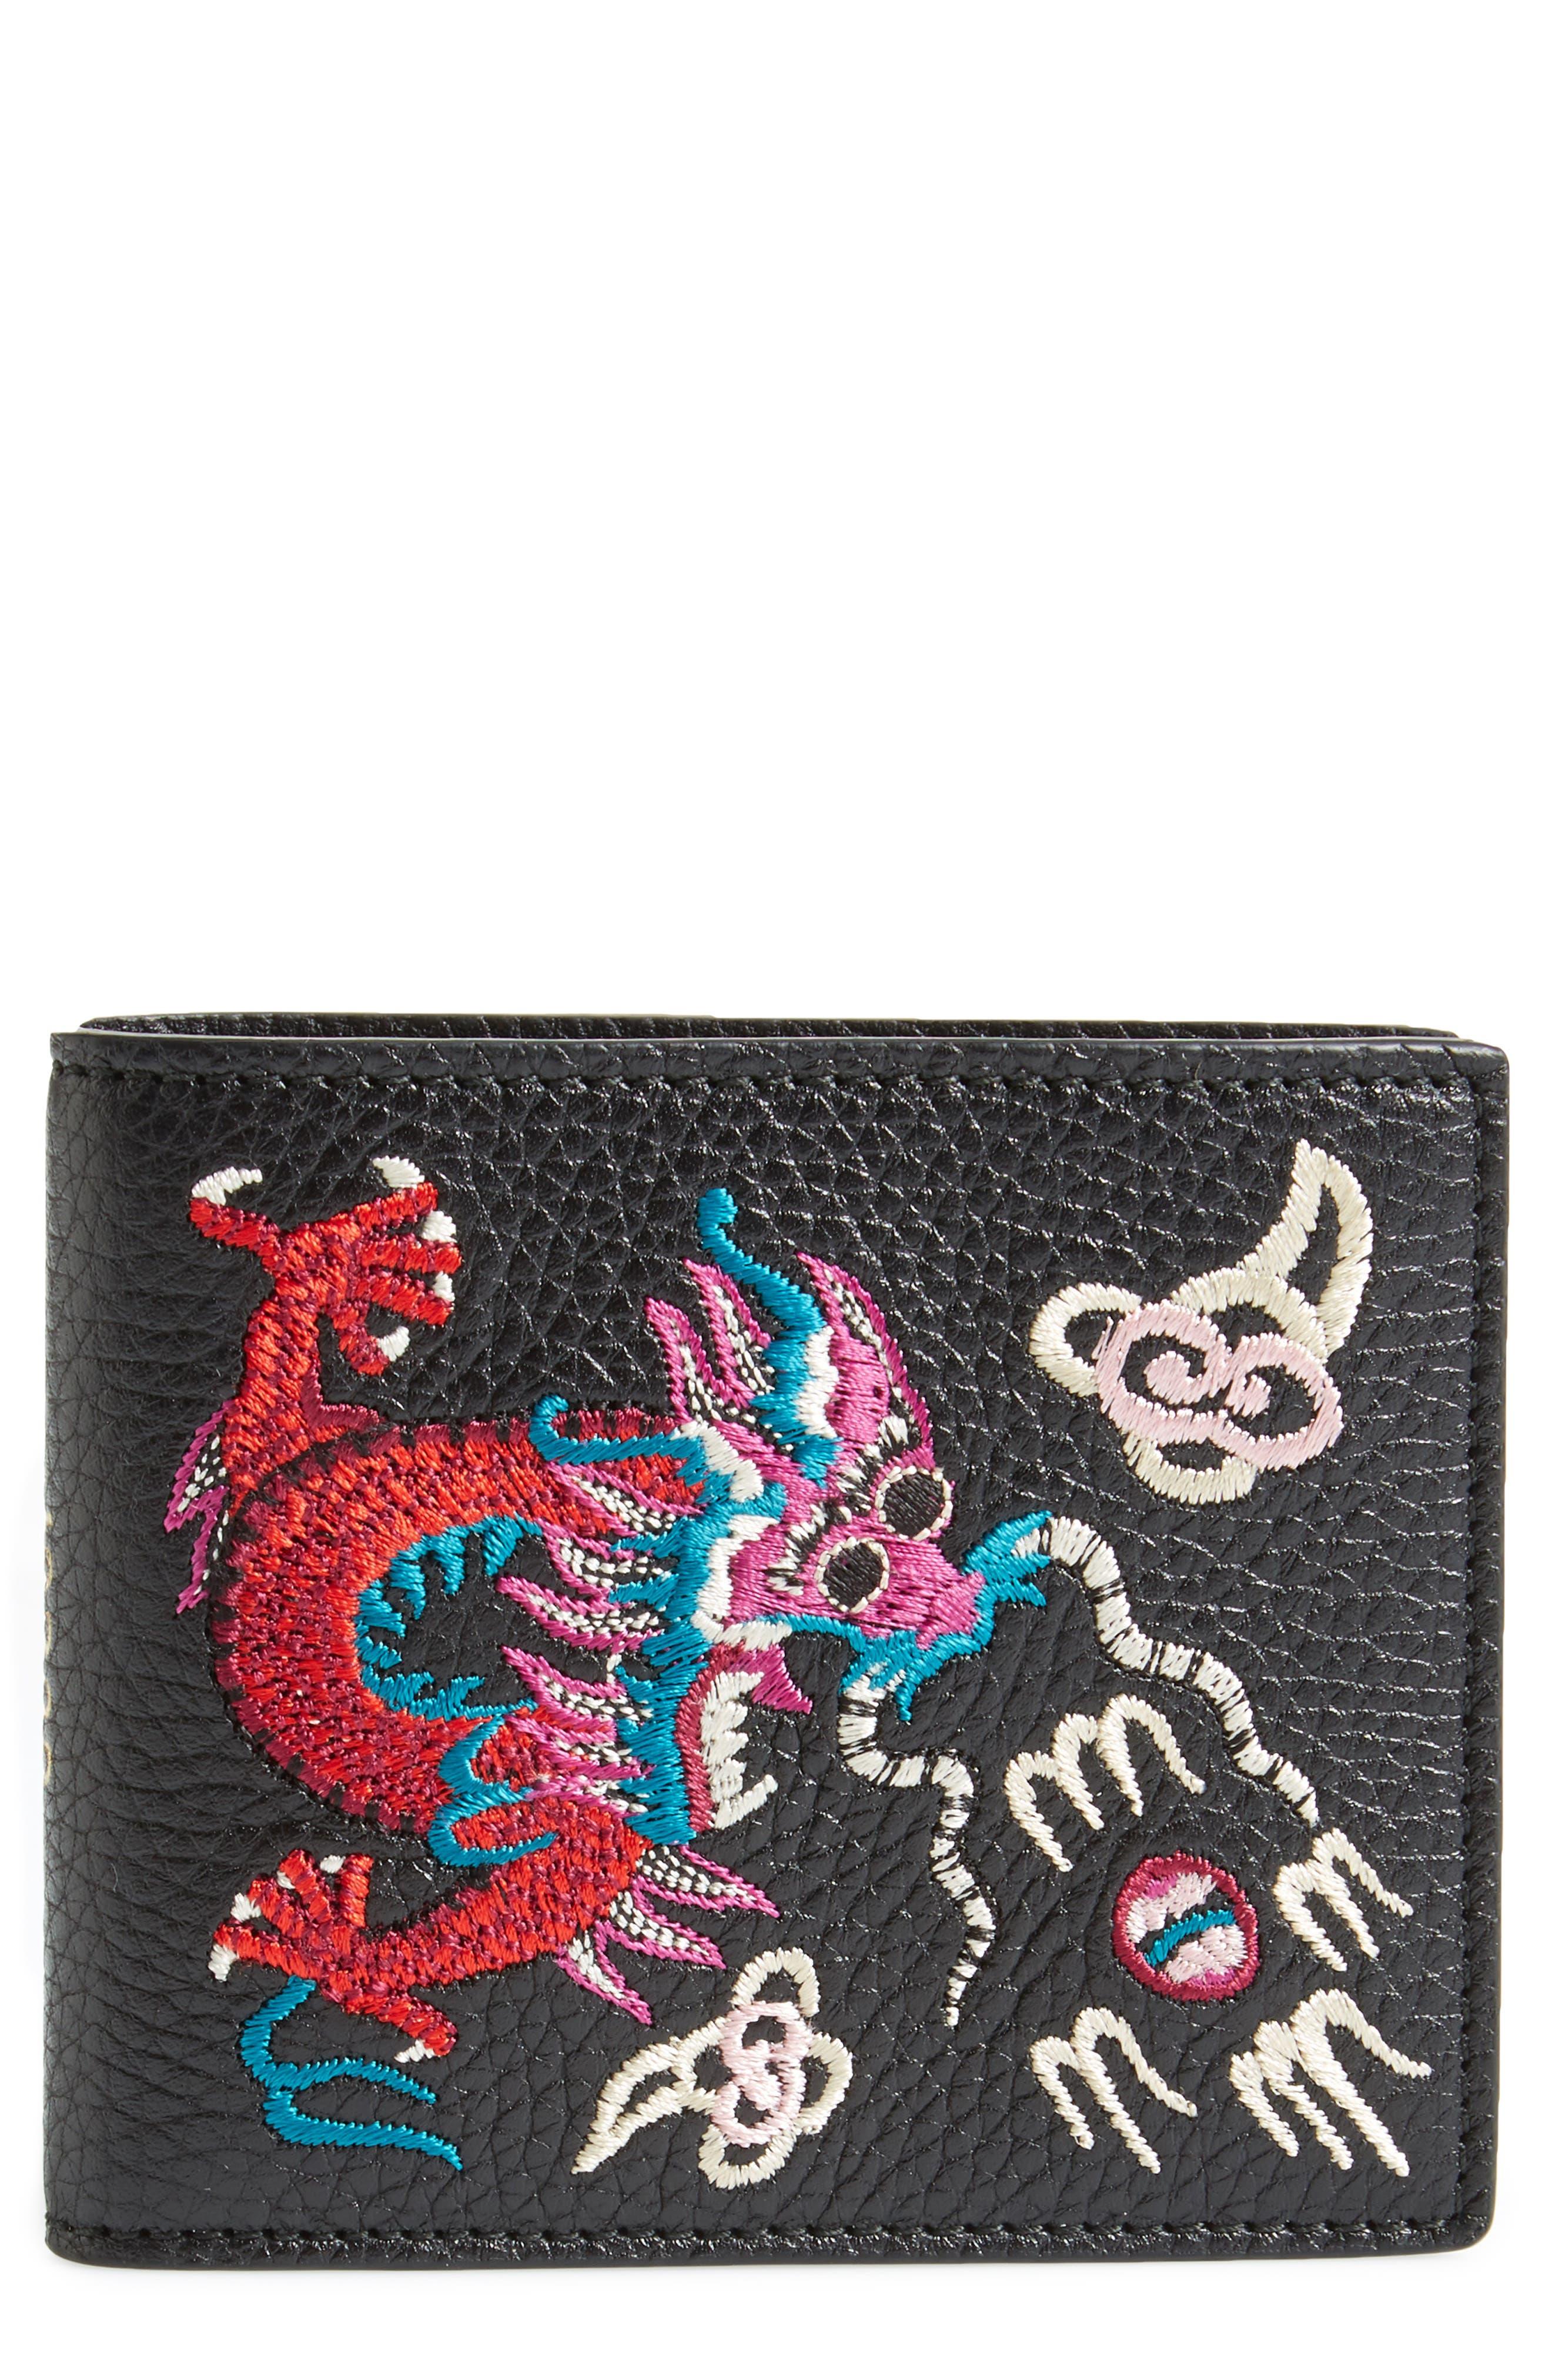 Dragon Leather Wallet,                             Main thumbnail 1, color,                             001